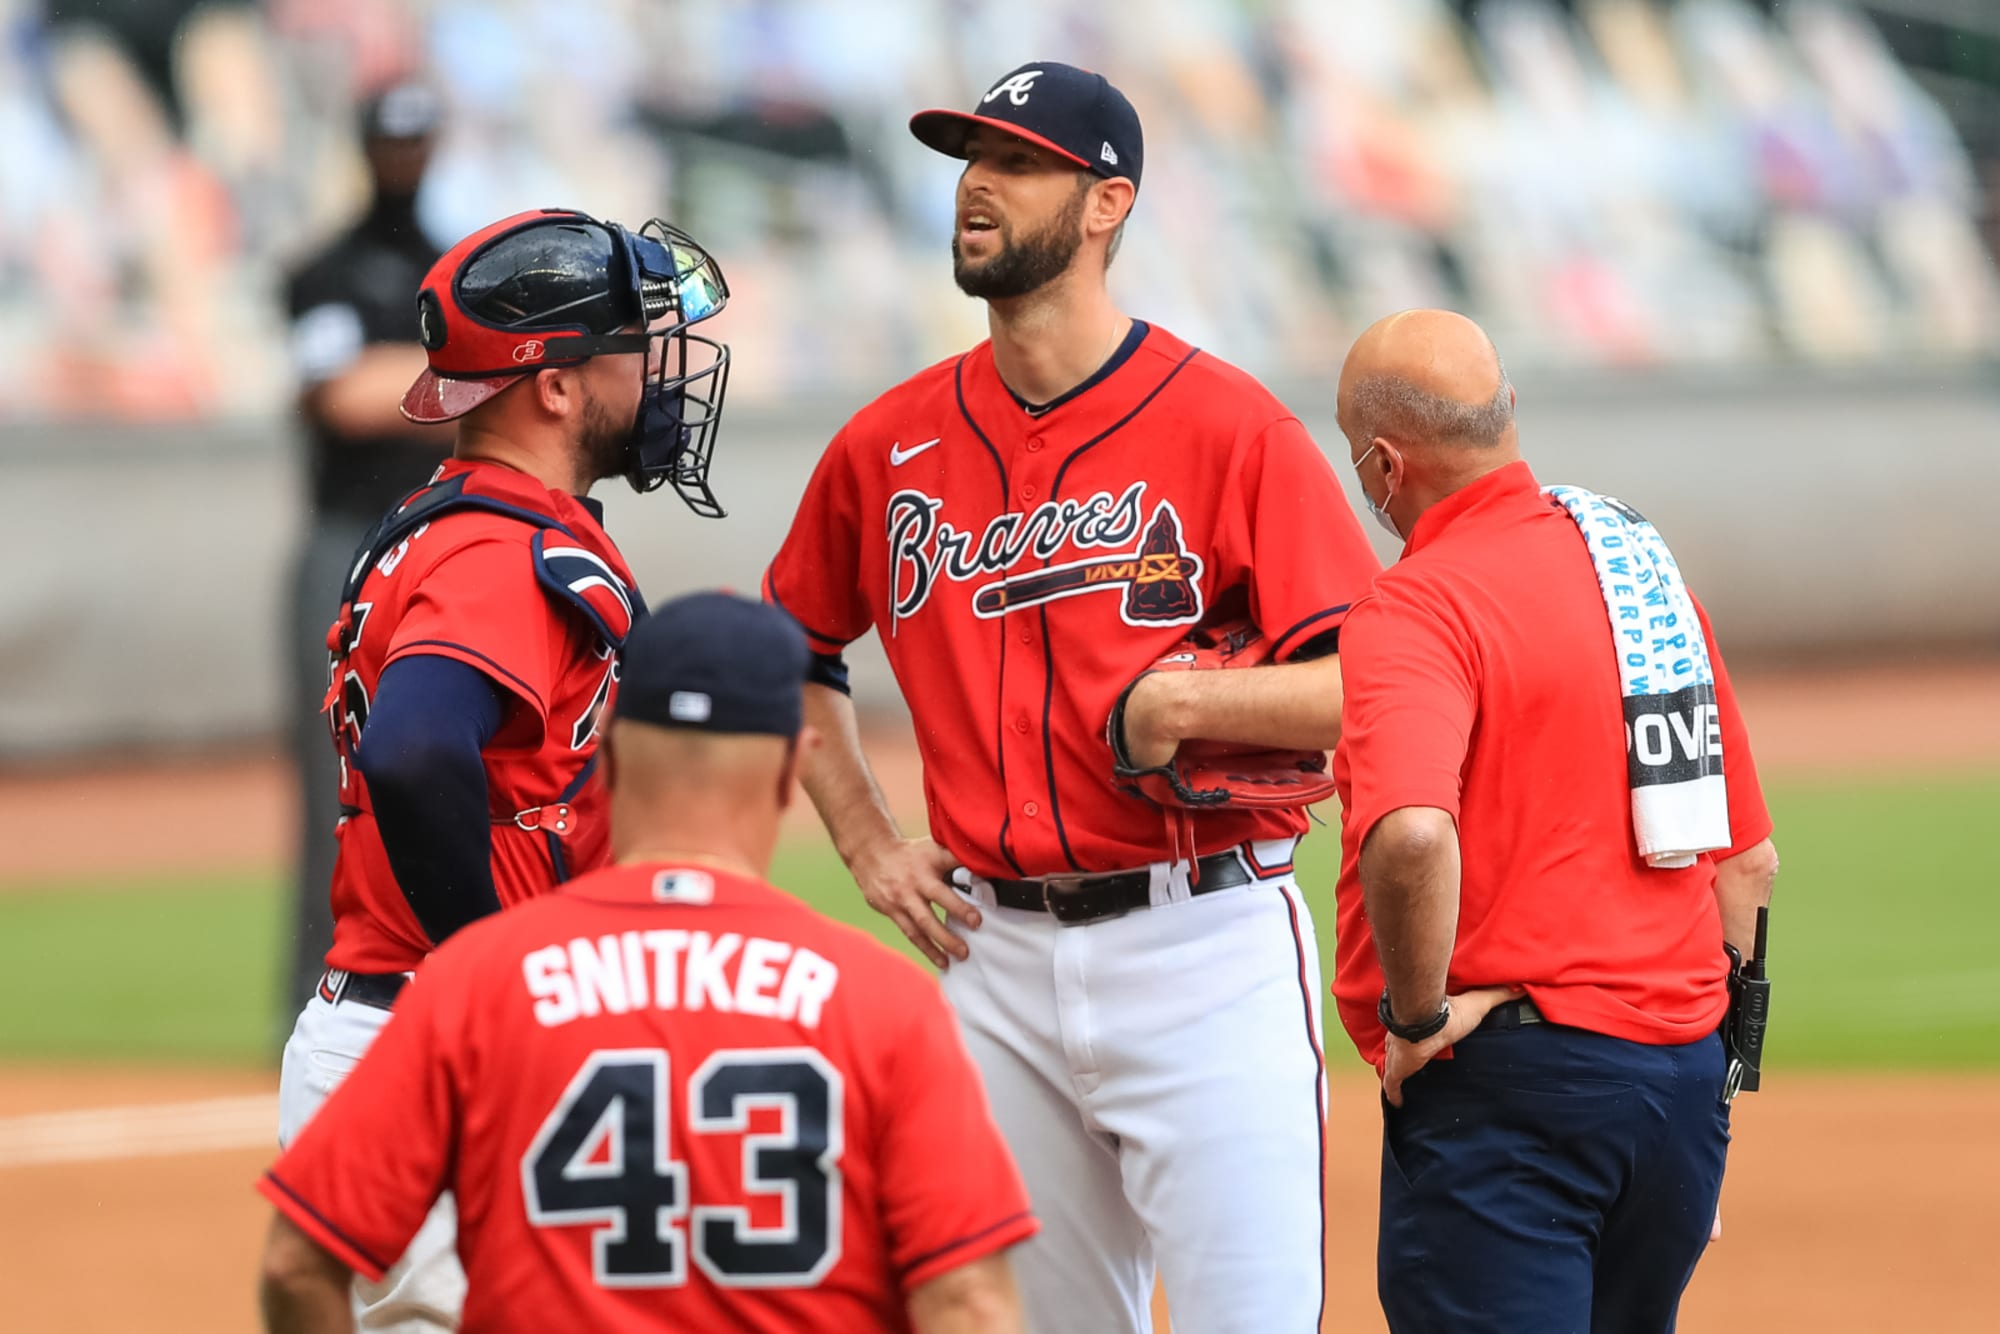 Braves Injury News: Ronald Acuña Jr., Austin Riley, Chris Martin Good to Go